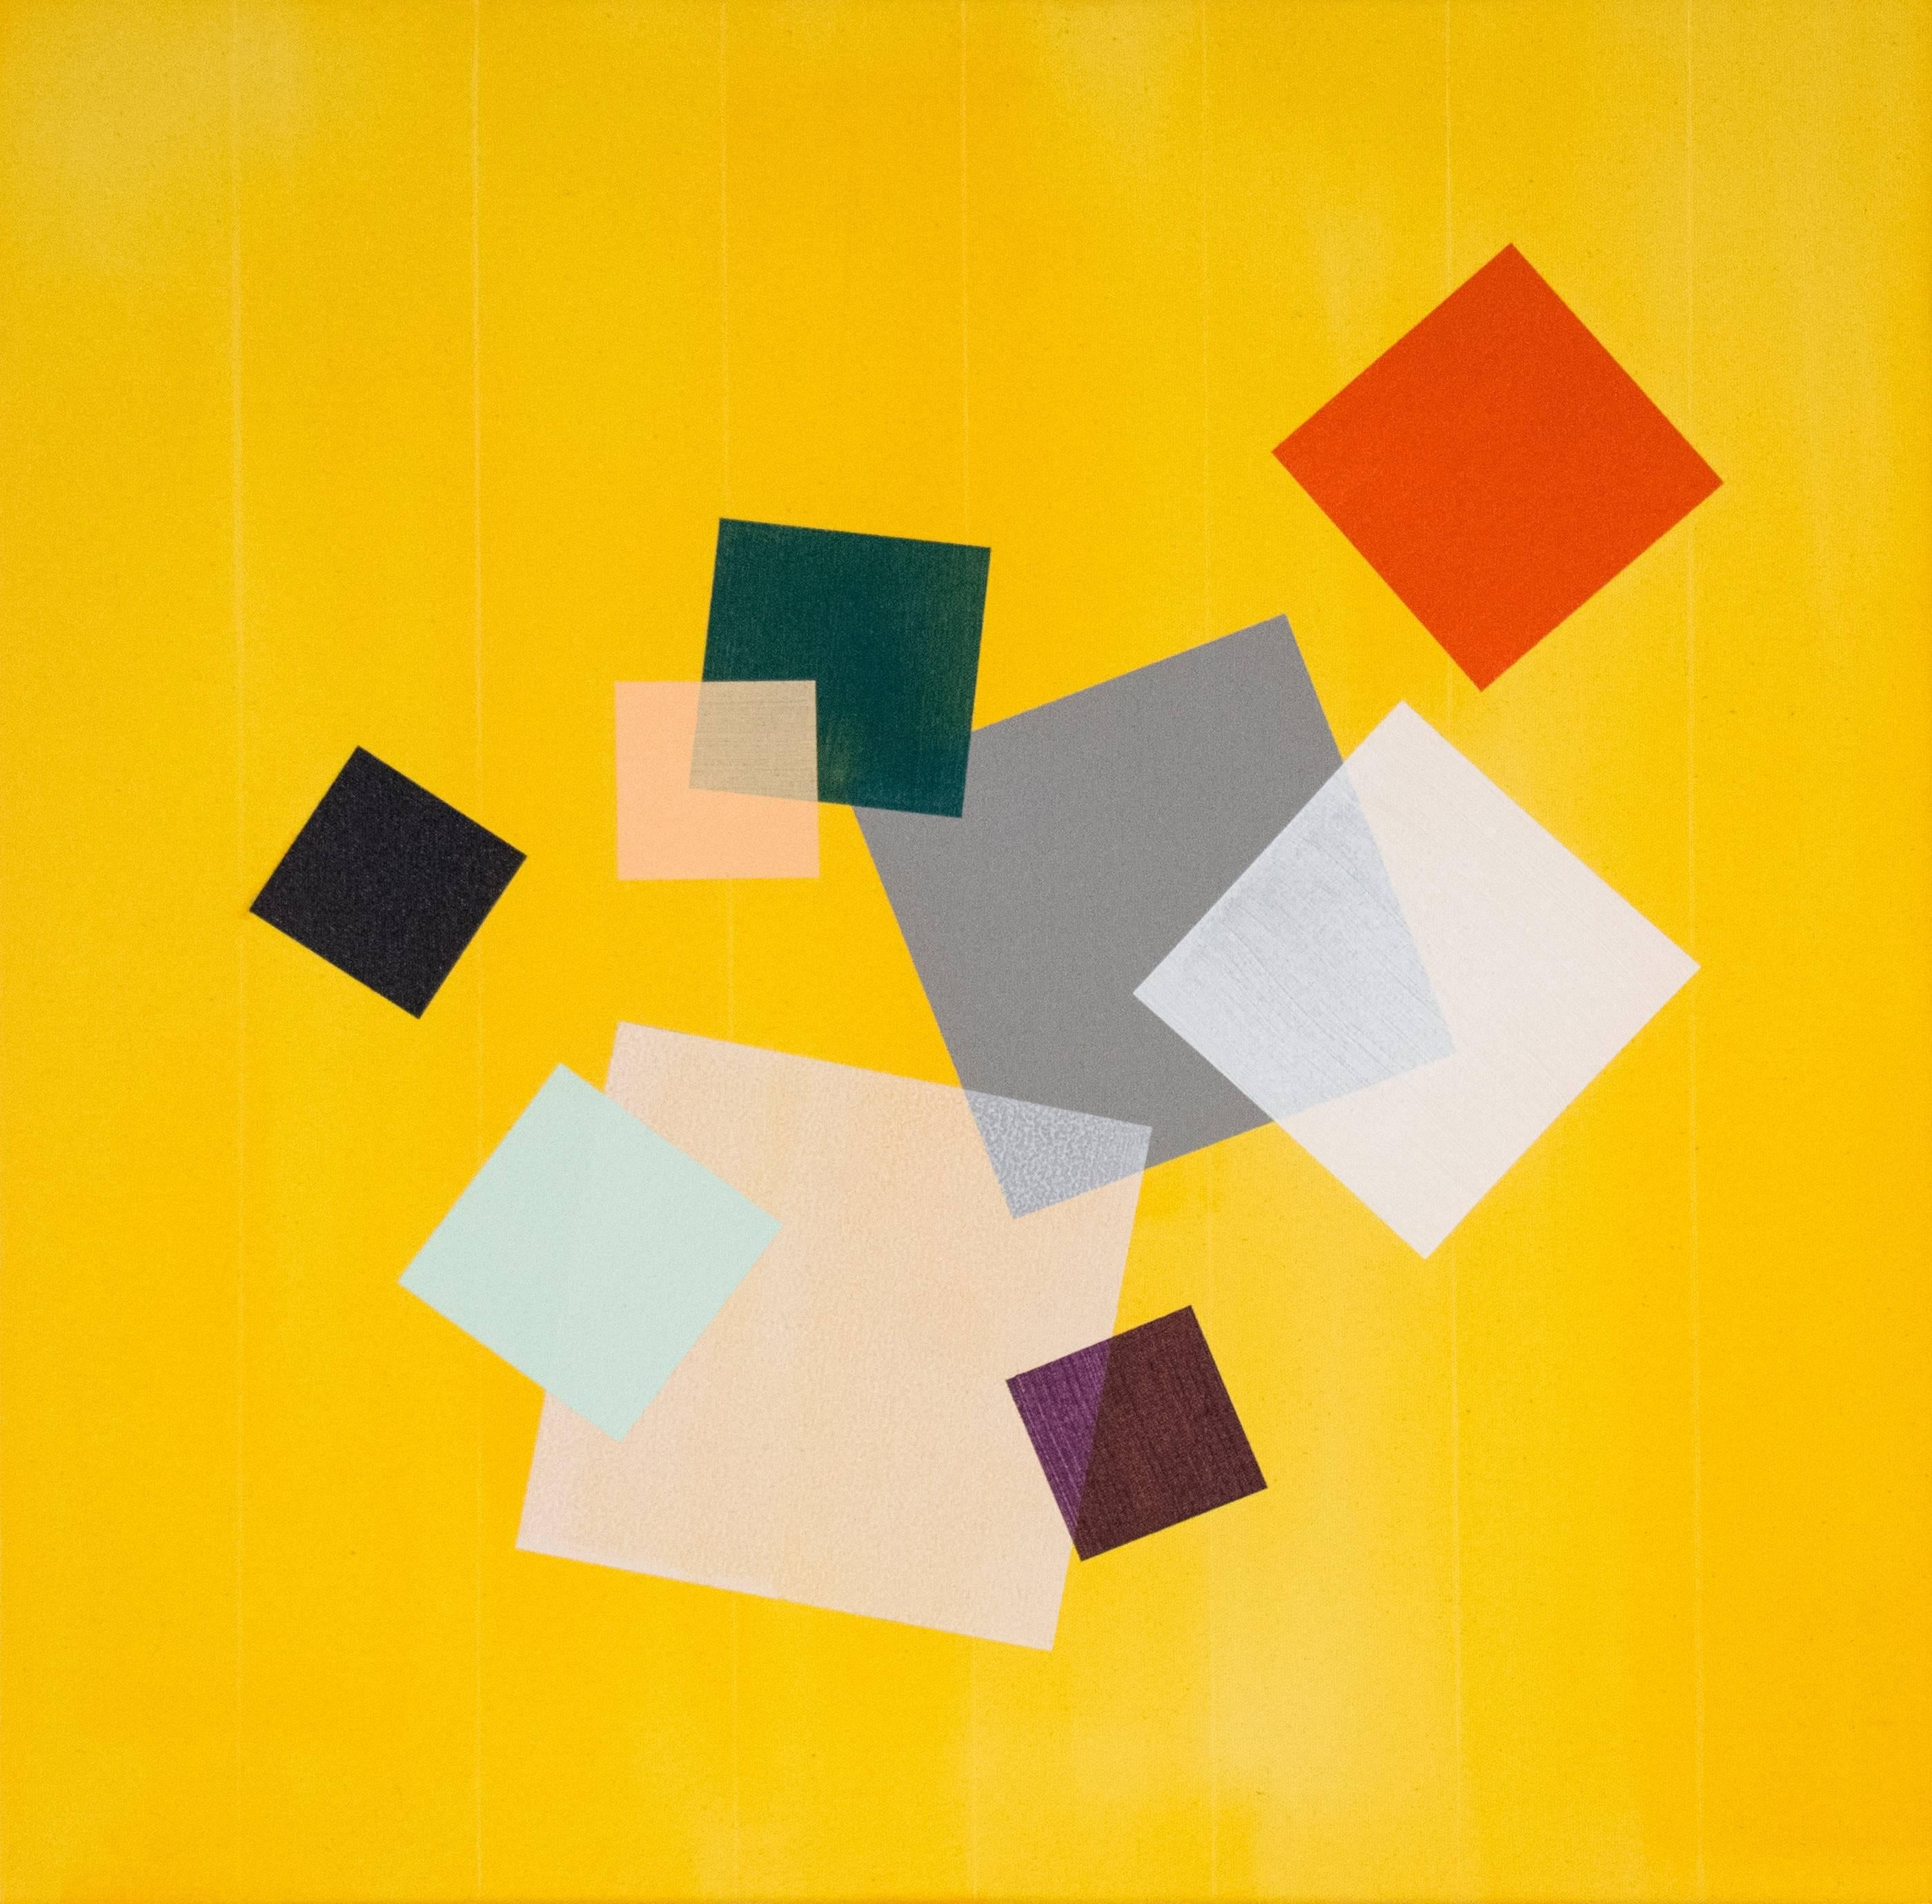 Yellow Grid Play - orange, grey, green, geometric abstract, acrylic on canvas